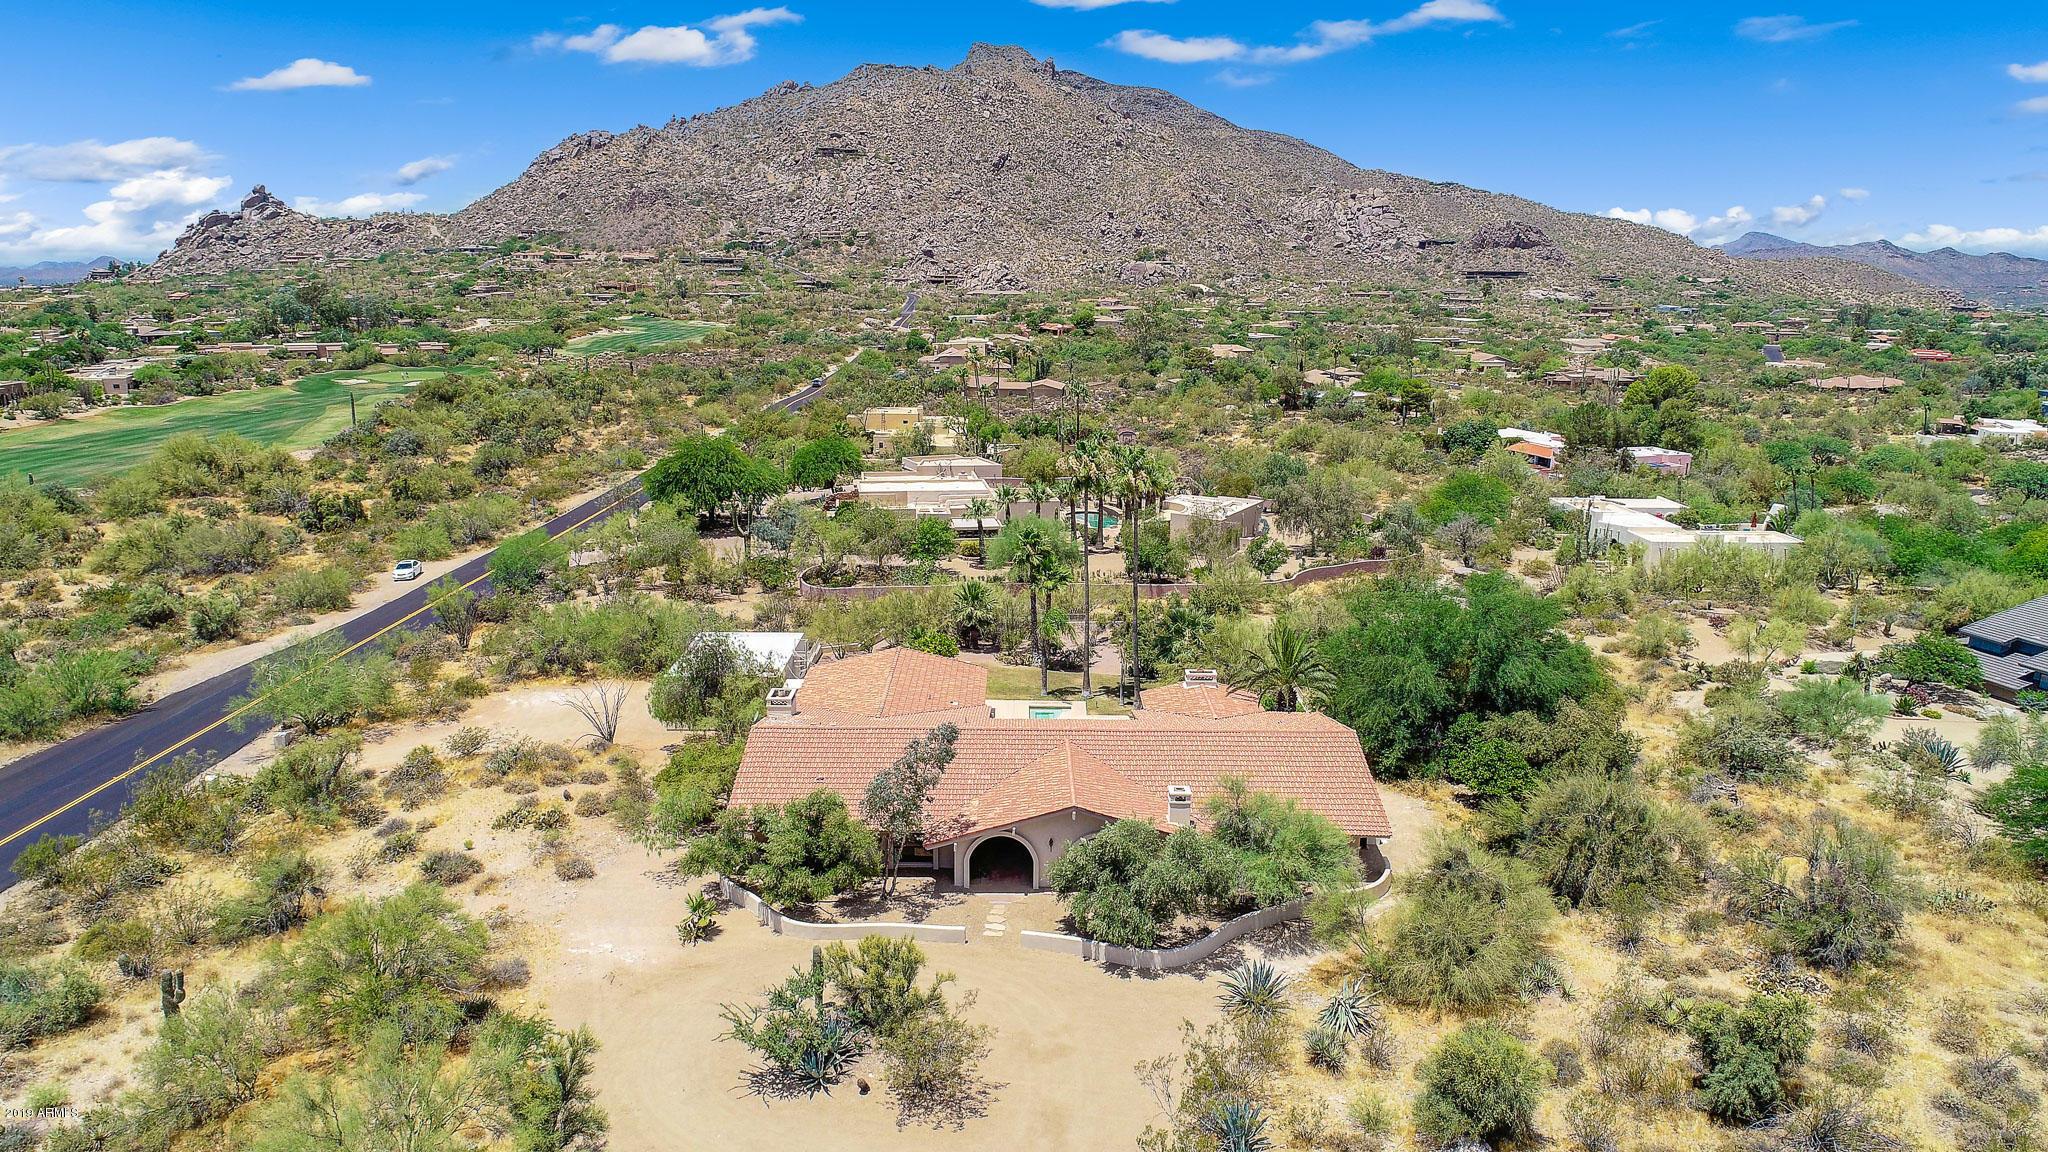 MLS 5879618 7490 E STAGECOACH Pass, Carefree, AZ 85377 Carefree AZ Three Bedroom